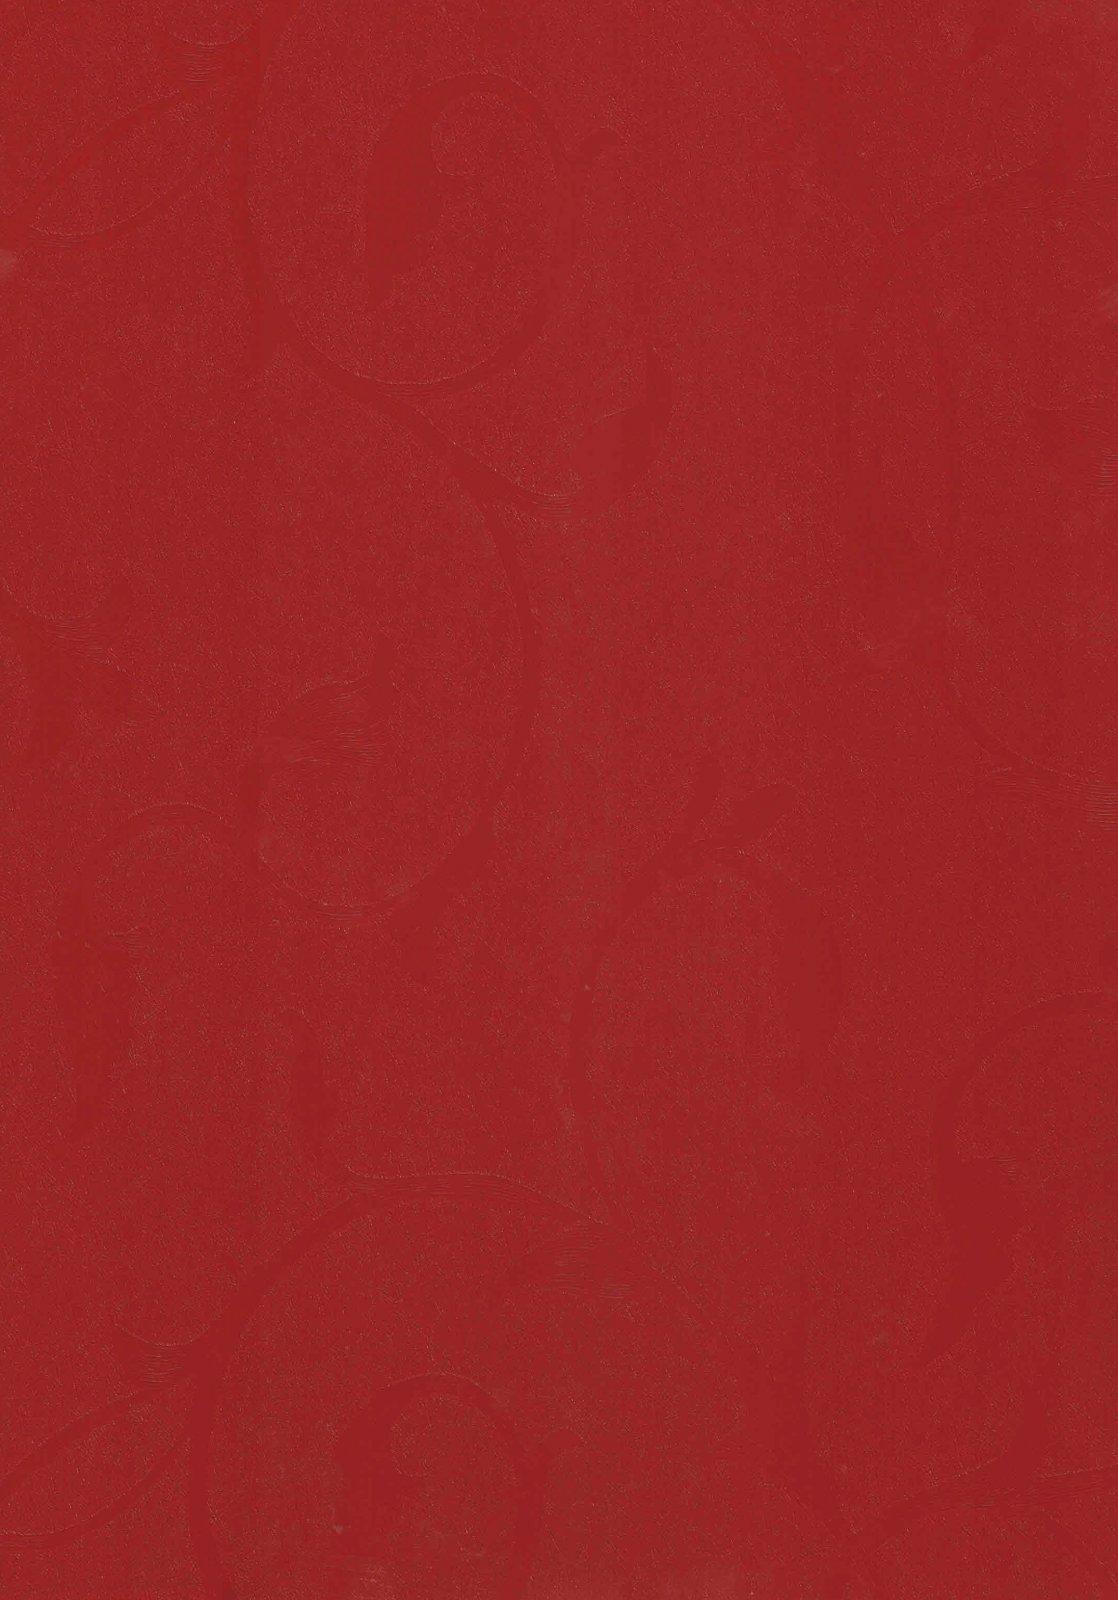 Пленка ПВХ Лилия красная ПЭТ